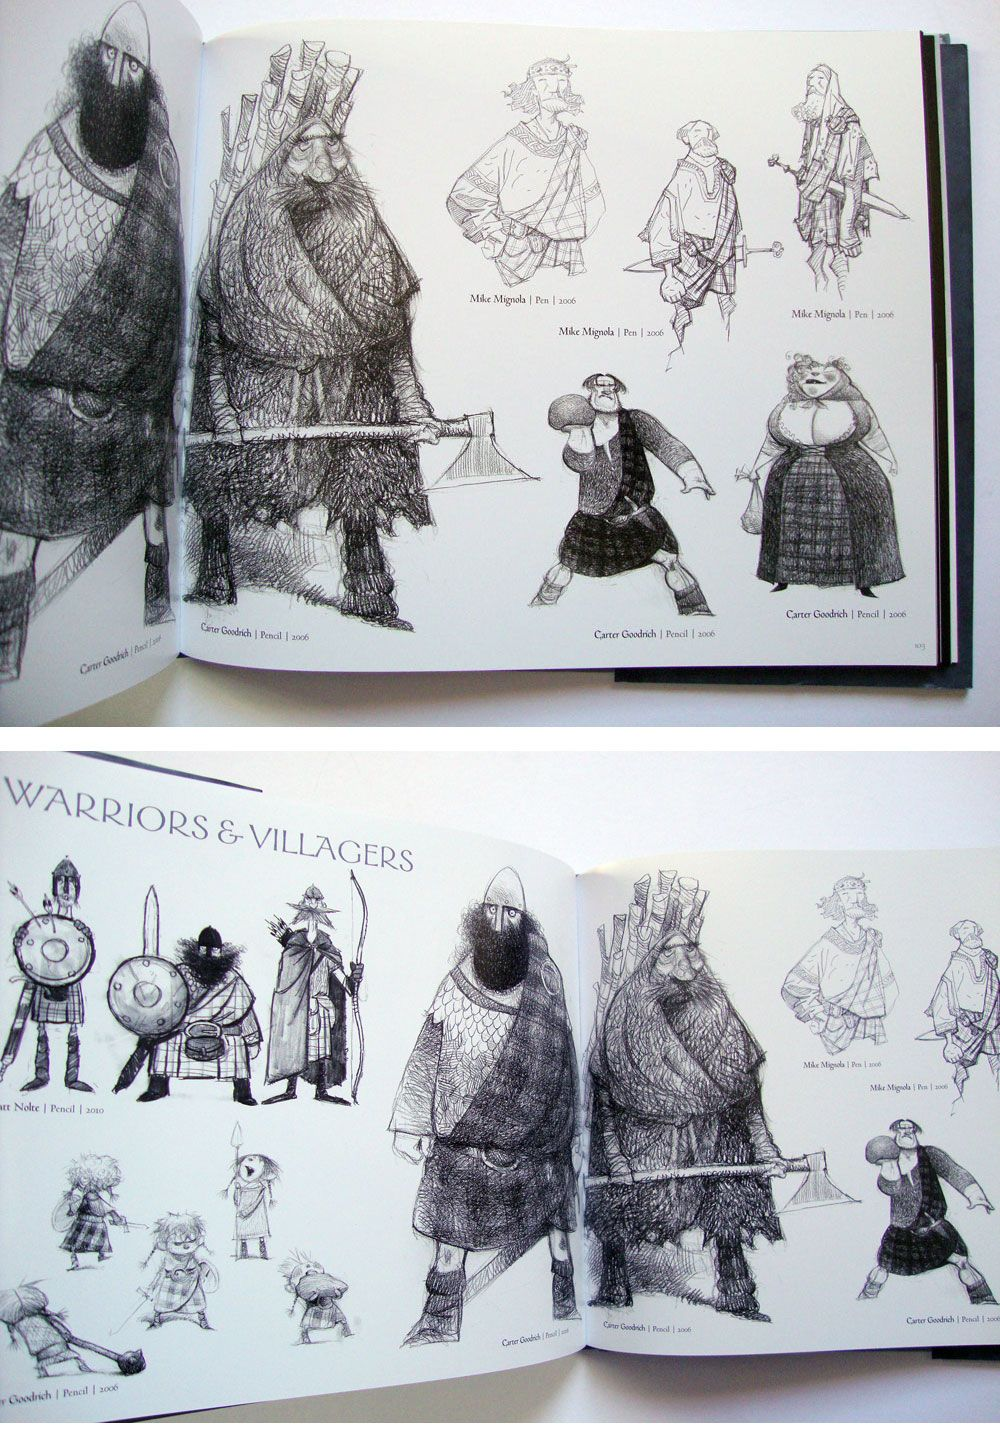 http://theconceptartblog.com/wp-content/uploads/2012/07/Brave-concept-book-03.jpg